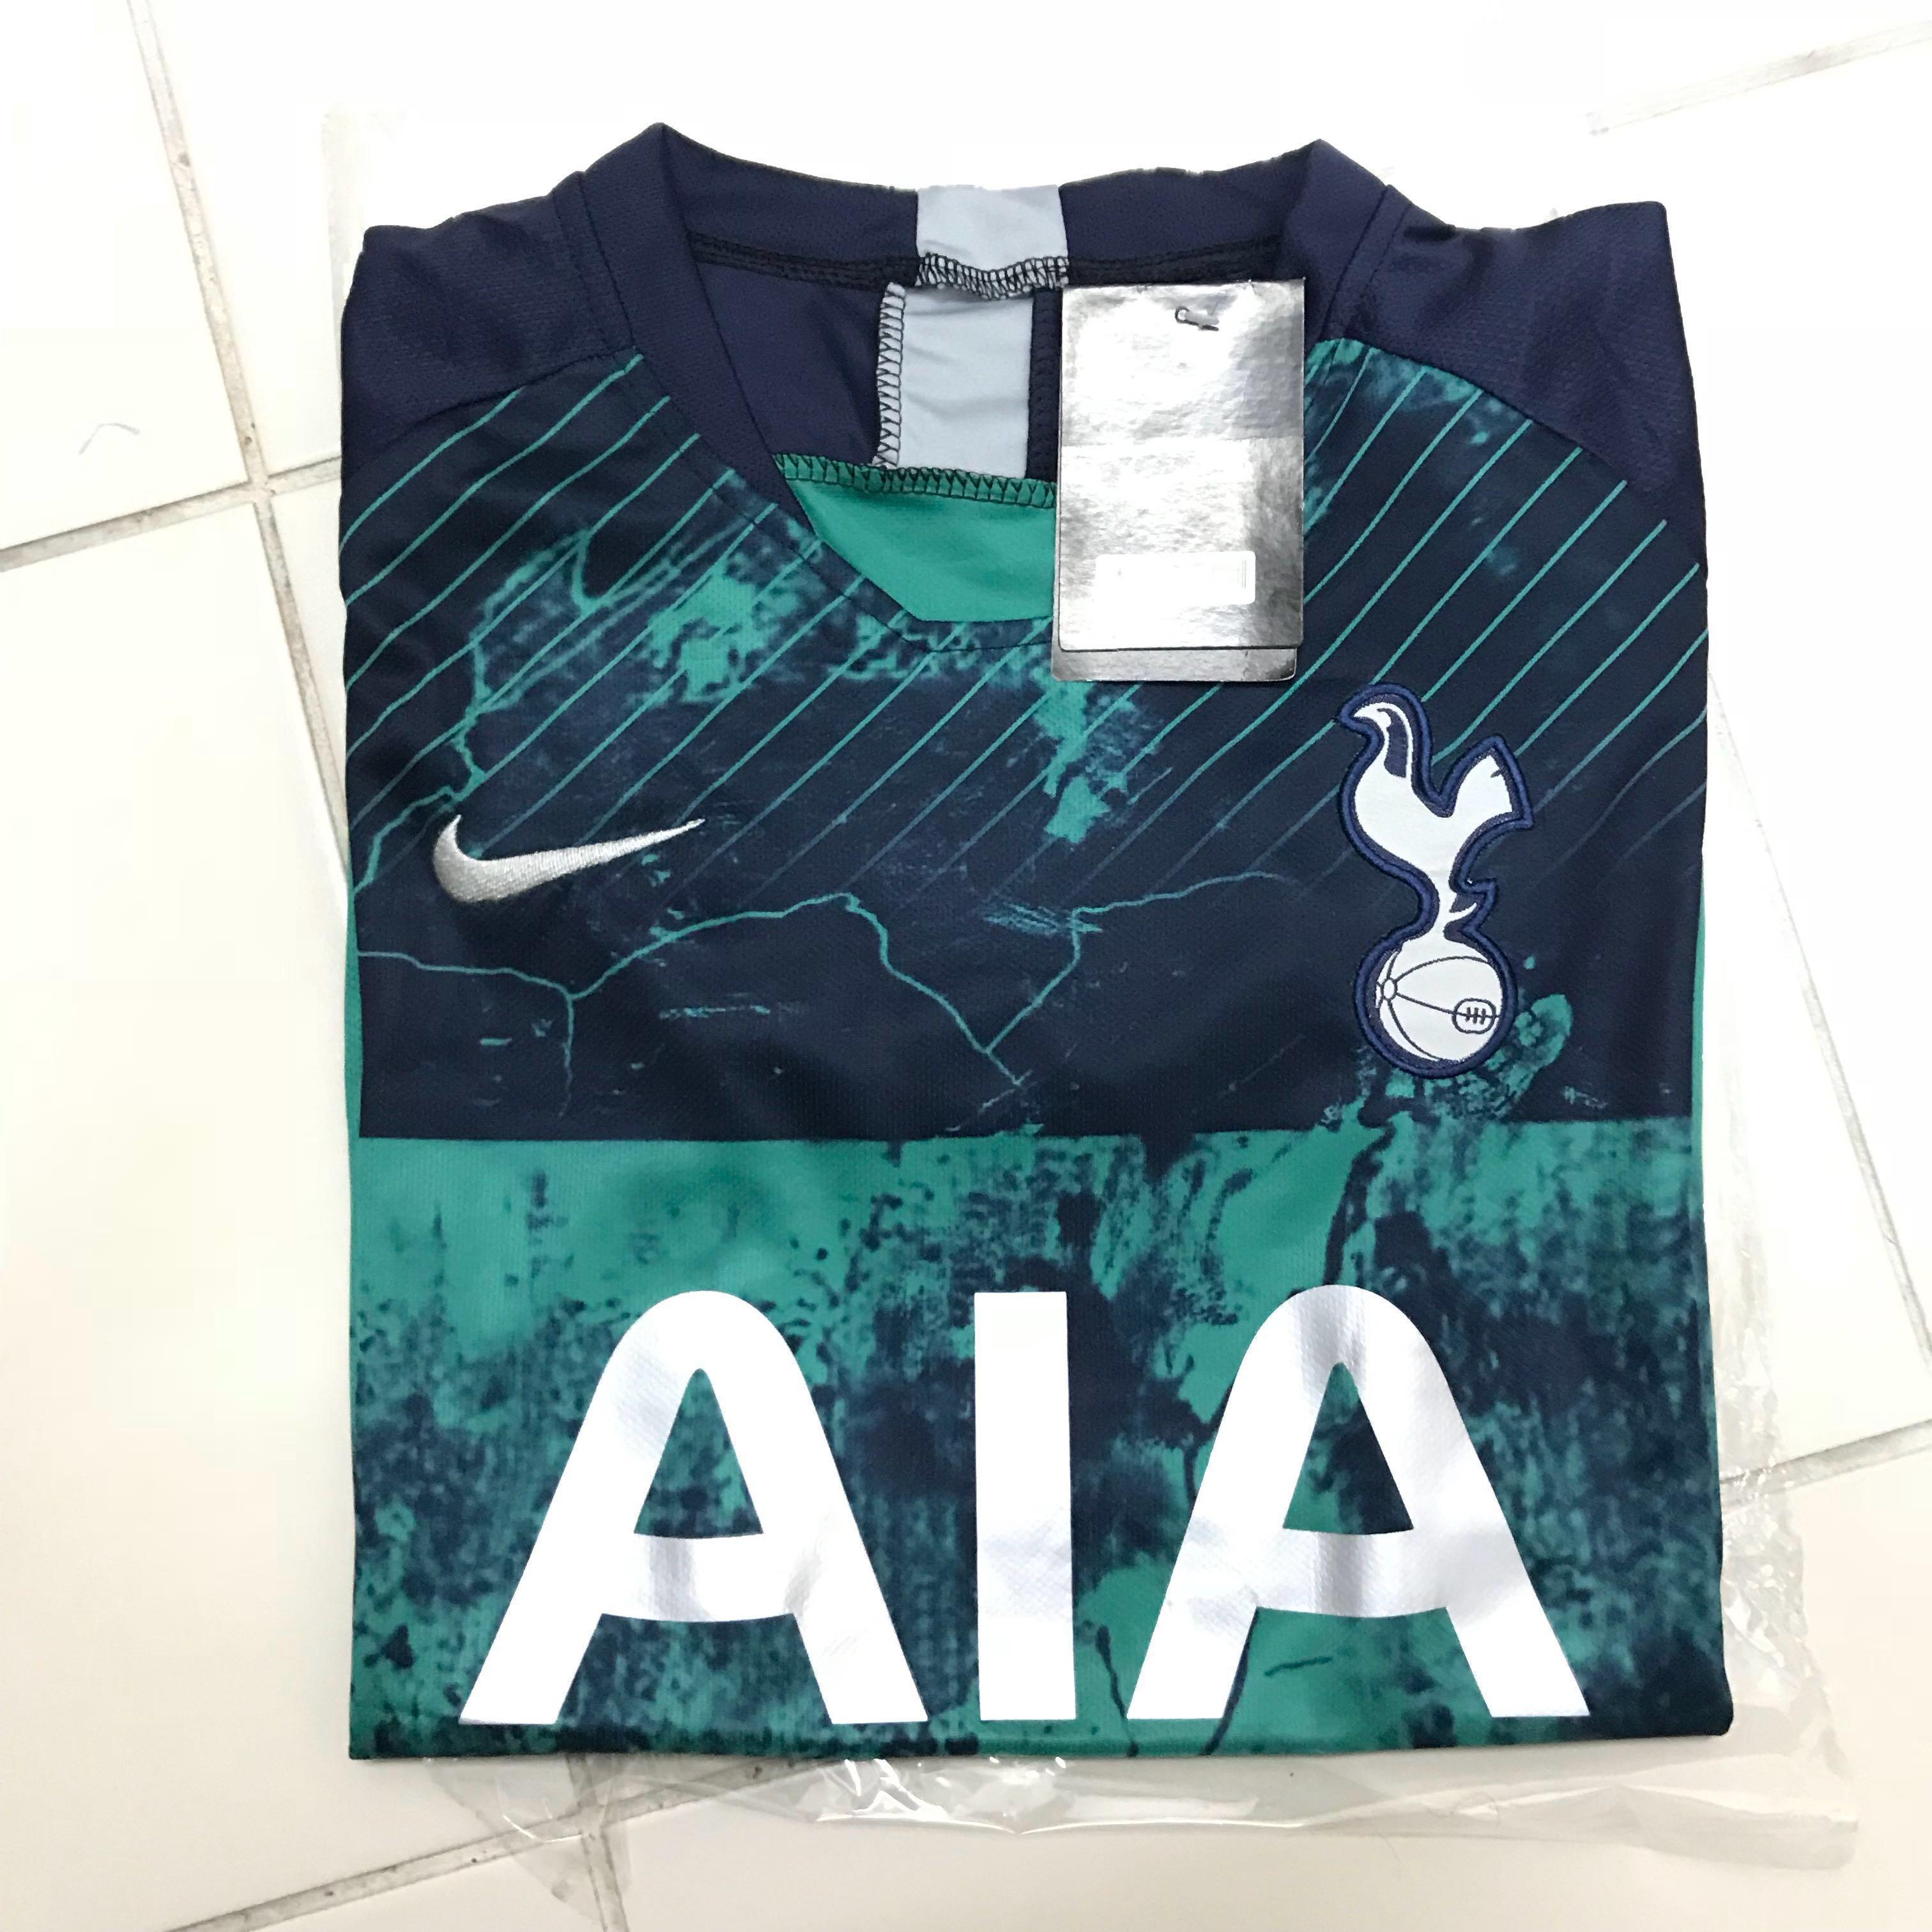 reputable site f95eb ace01 Tottenham hotspur spurs 3rd kit, Men's Fashion, Clothes ...